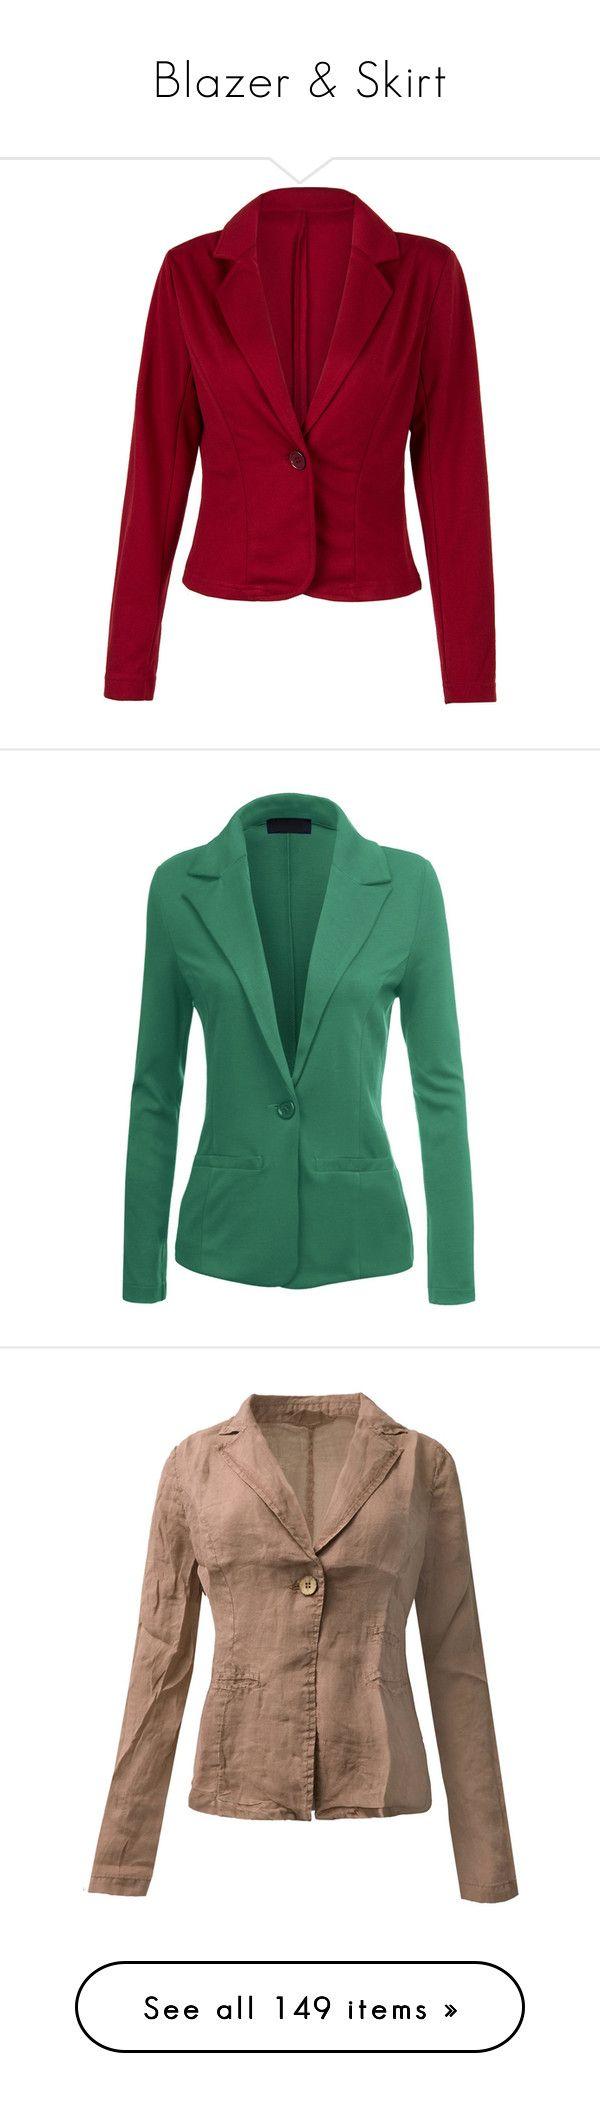 """Blazer & Skirt"" by vesper1977 ❤ liked on Polyvore featuring outerwear, jackets, blazers, lapel blazer, one button blazer, slim blazer, slim fit blazer, slim blazer jacket, fitted jacket and stretch jacket"